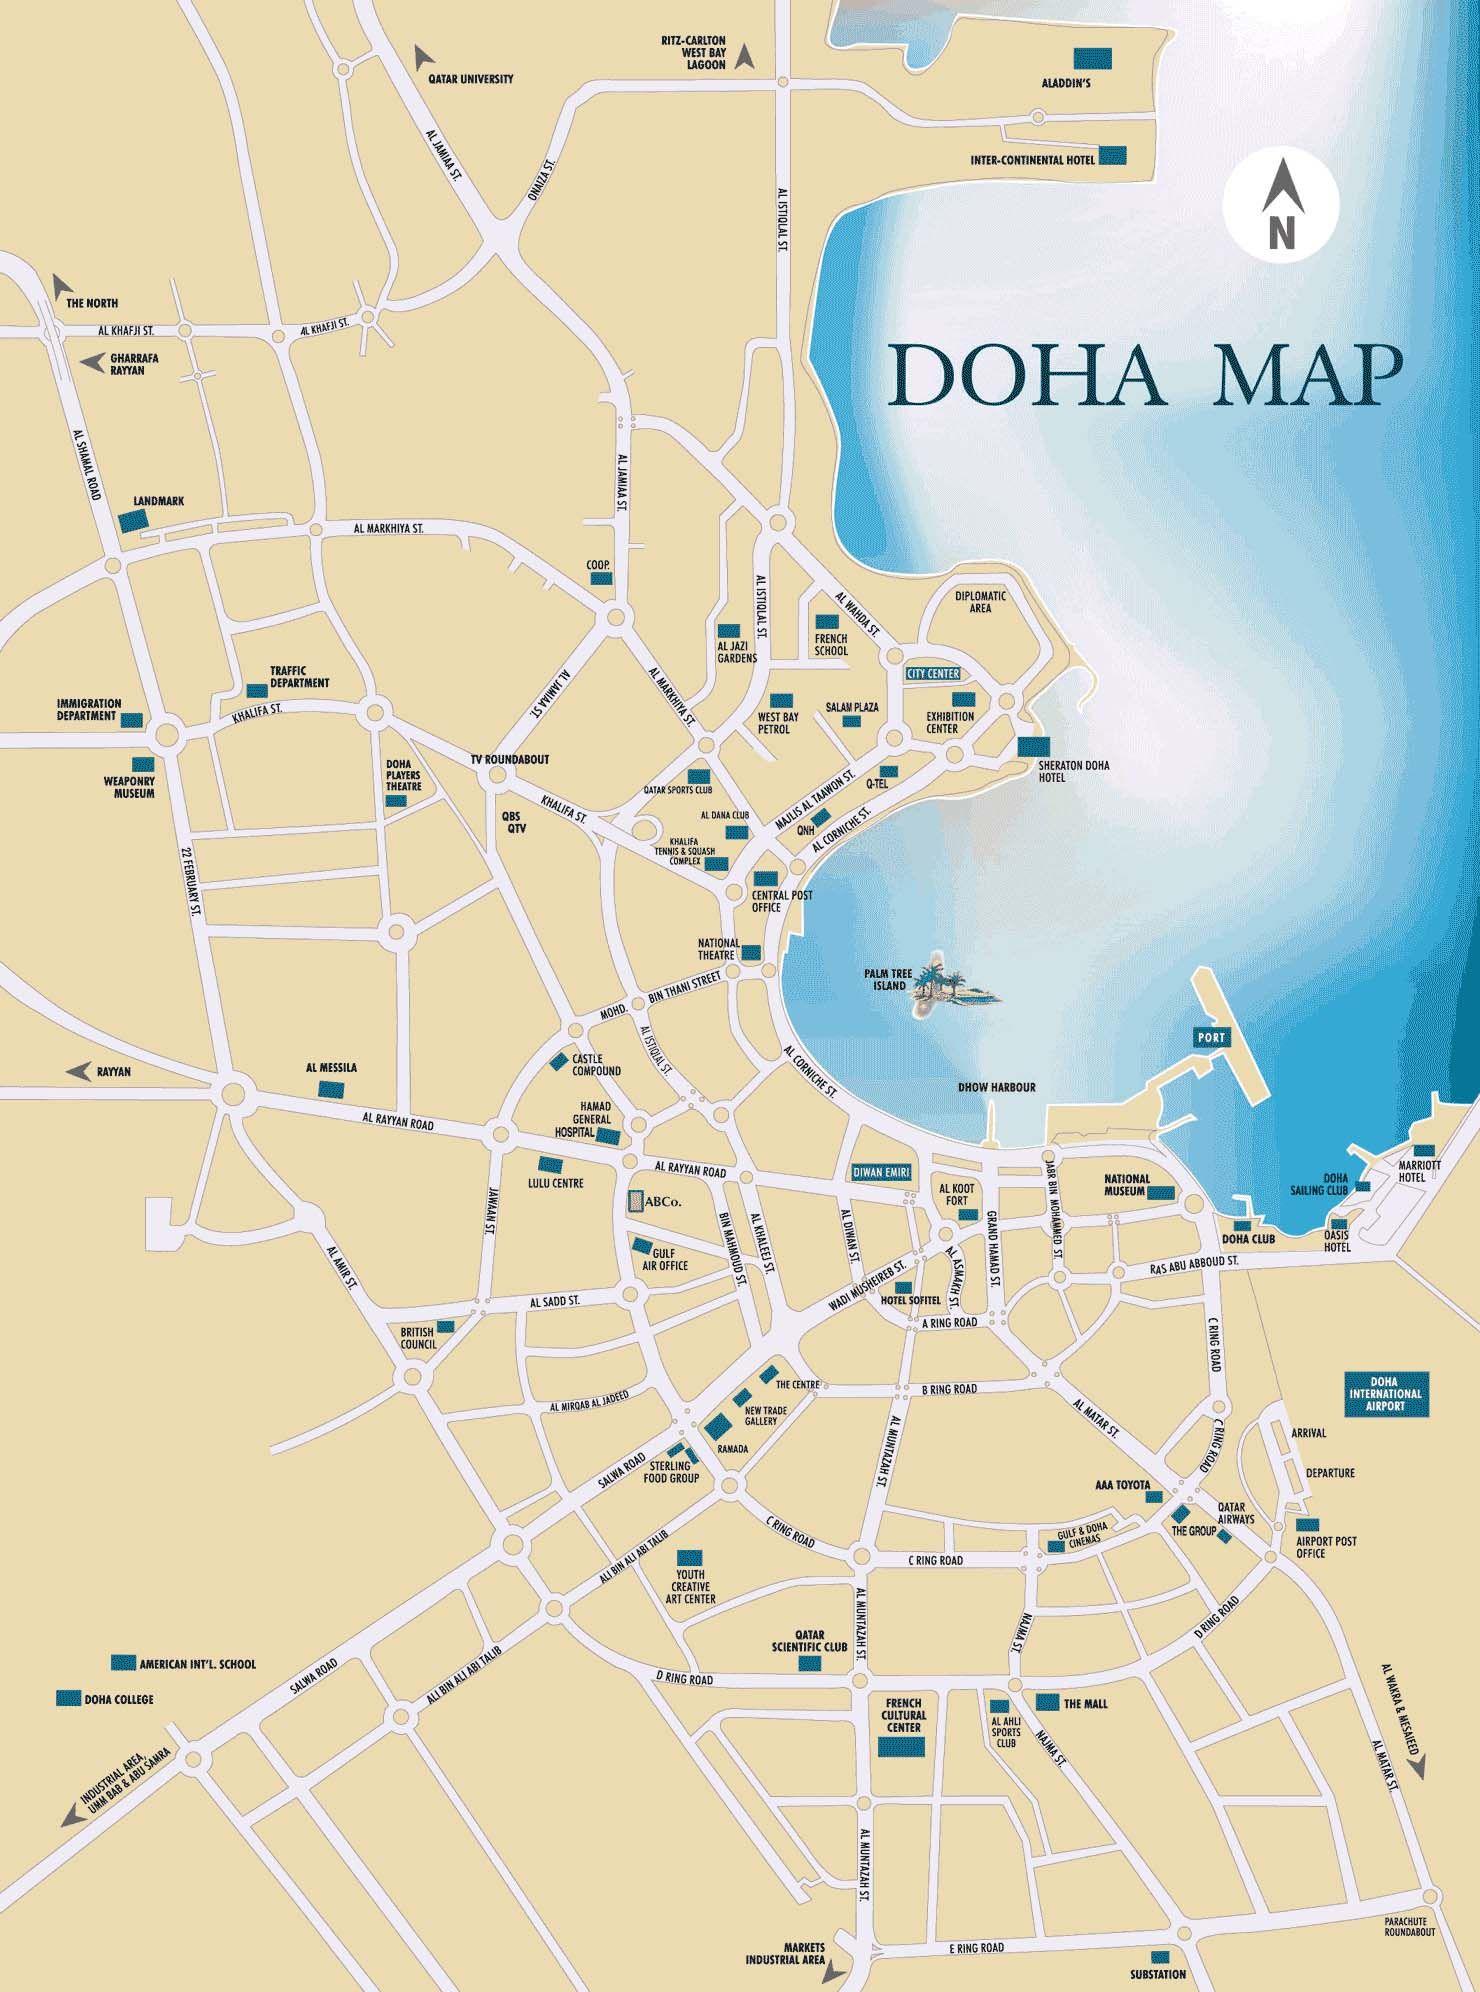 embassy of qatar map of doha this is qatar pinterest